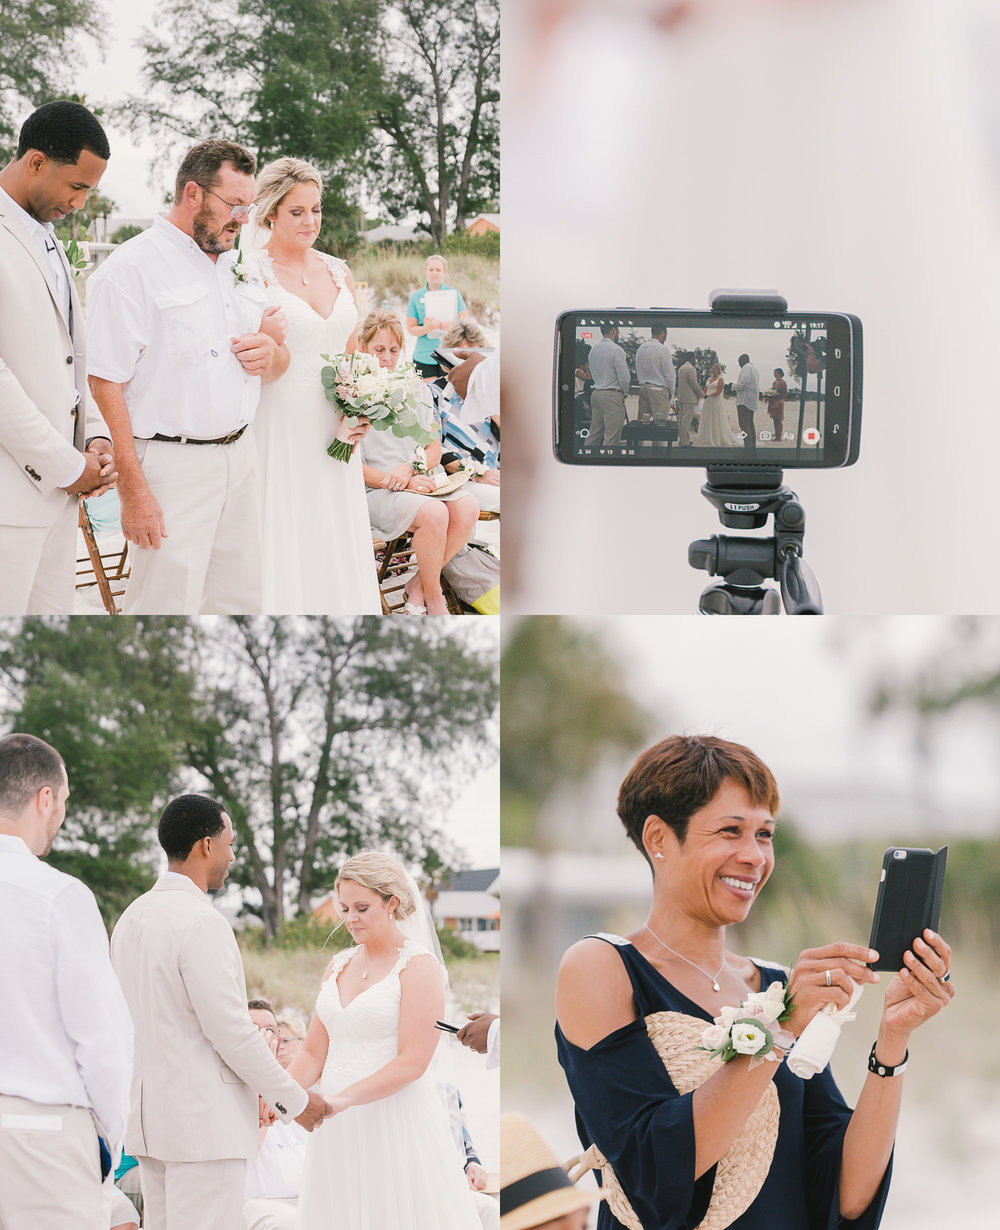 Florida-beach-wedding-ceremony-photo, Tampa-photographer